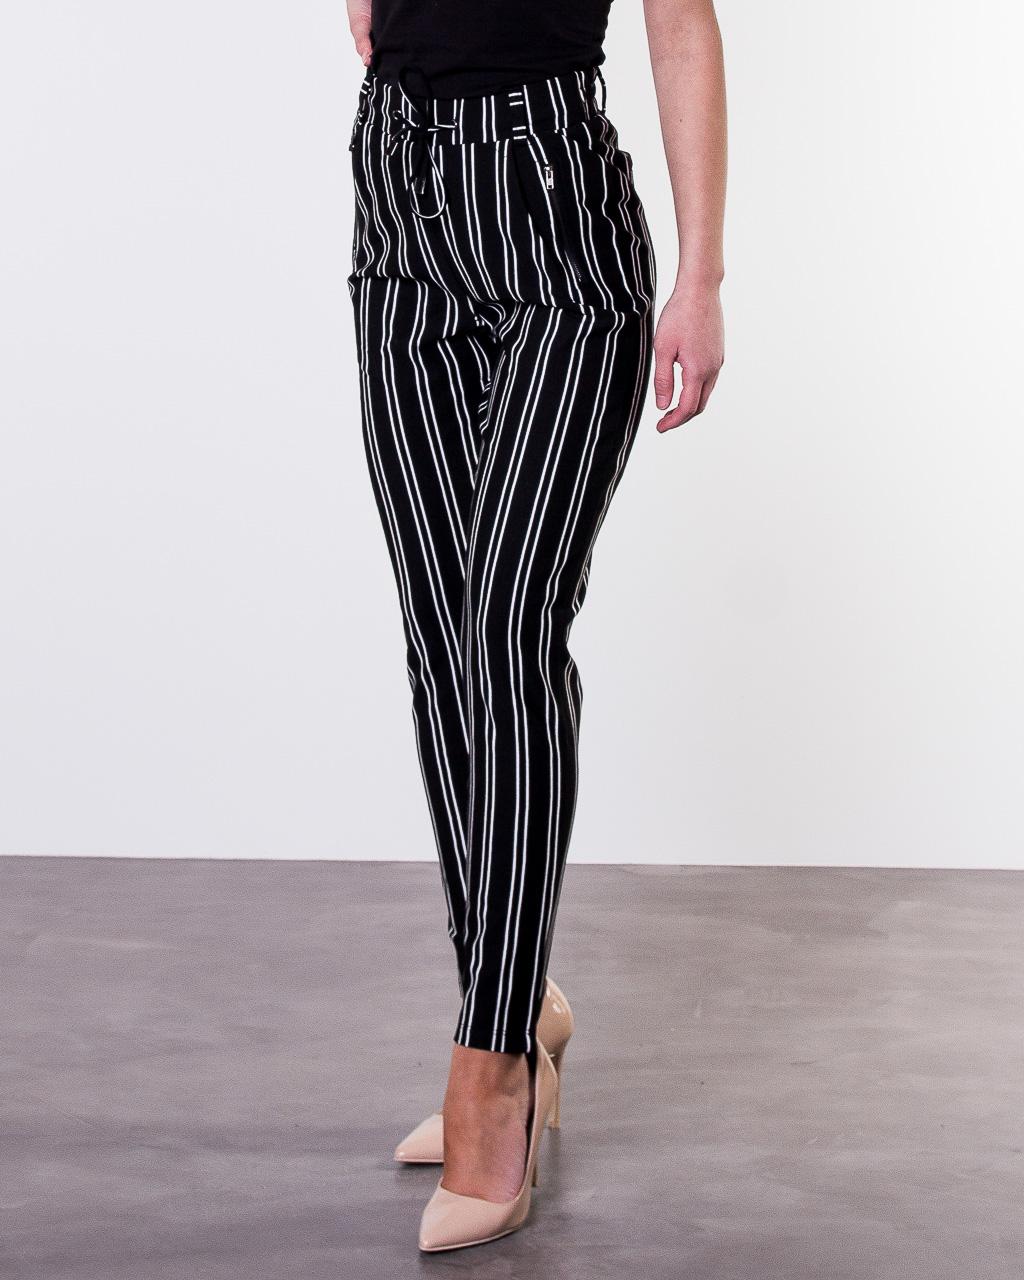 ca9b26f591d ... Cleo Trousers Striped. Kaipaatko apua koon tai värin valitsemisessa?